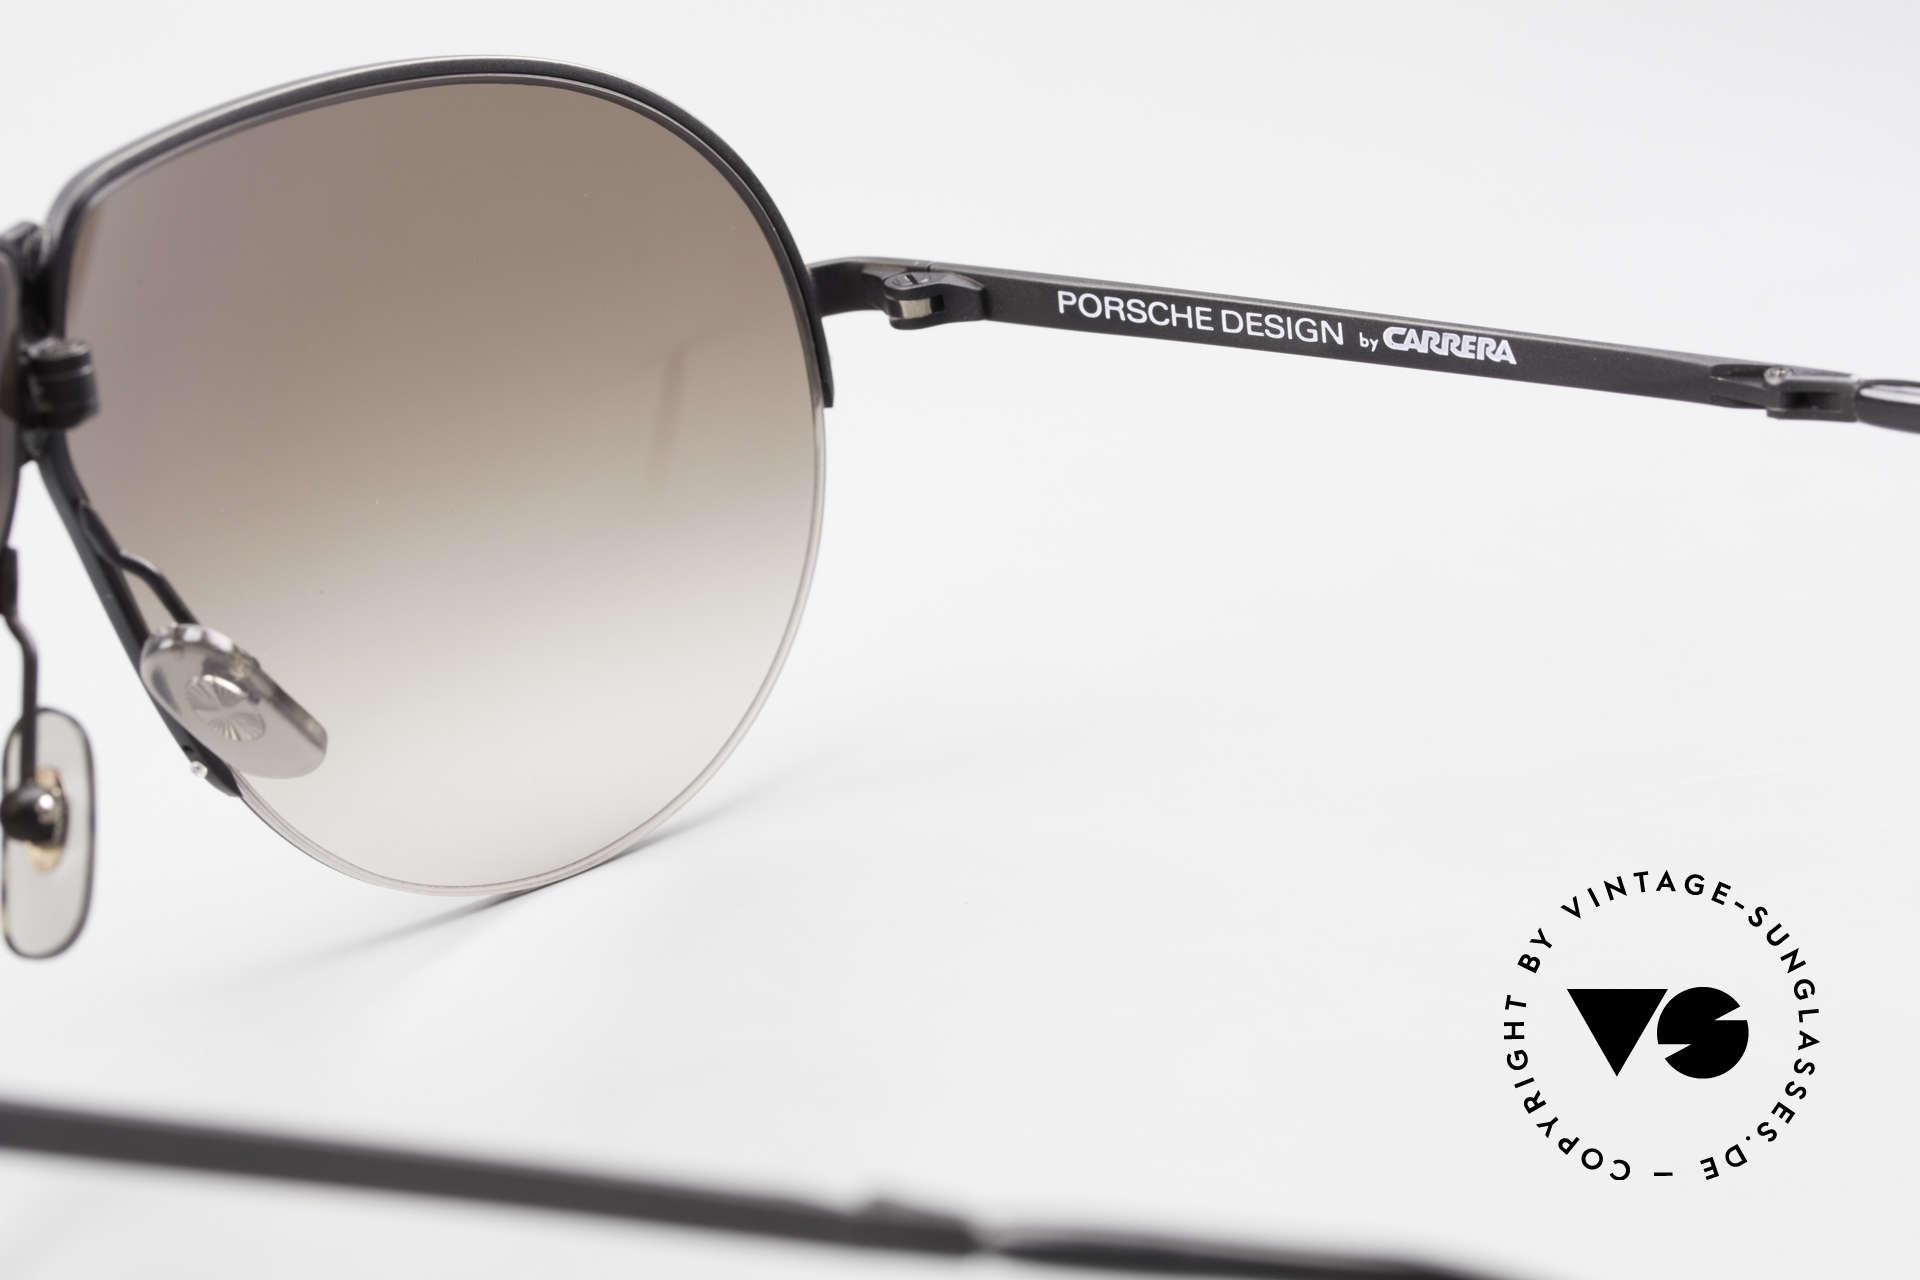 Porsche 5628 80's Folding Aviator Sunglasses, Size: medium, Made for Men